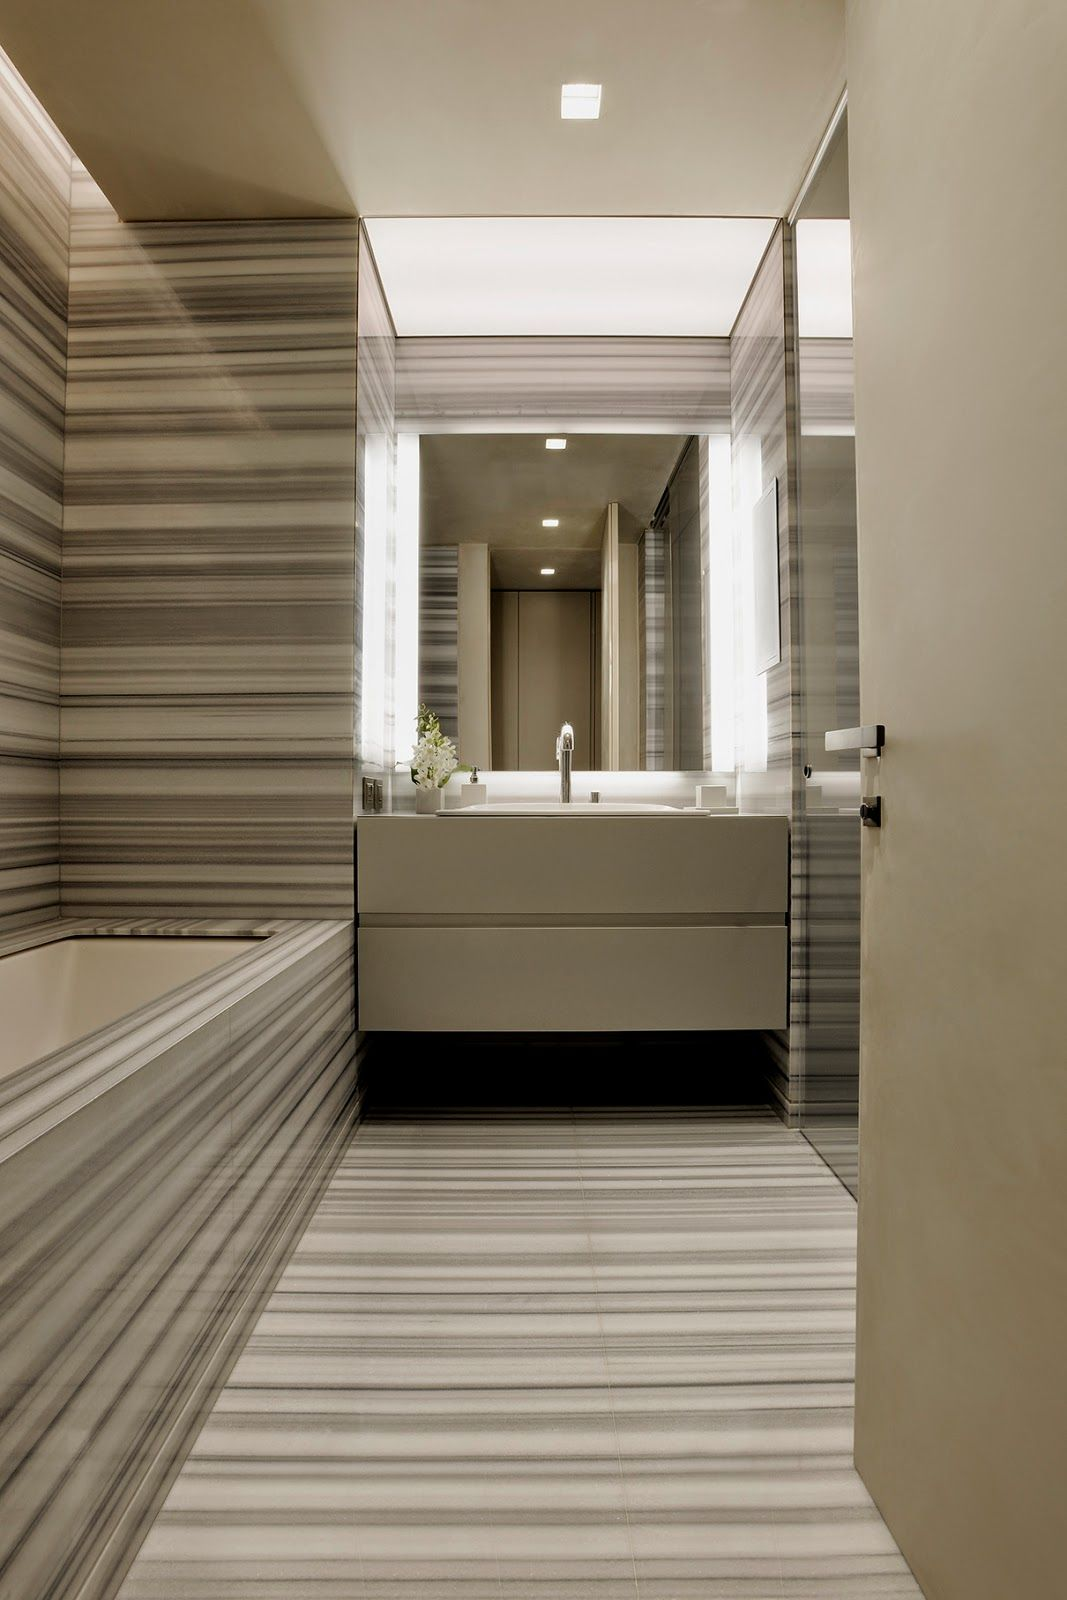 giorgio armani bathroom Google Search BATHROOM DESIGN